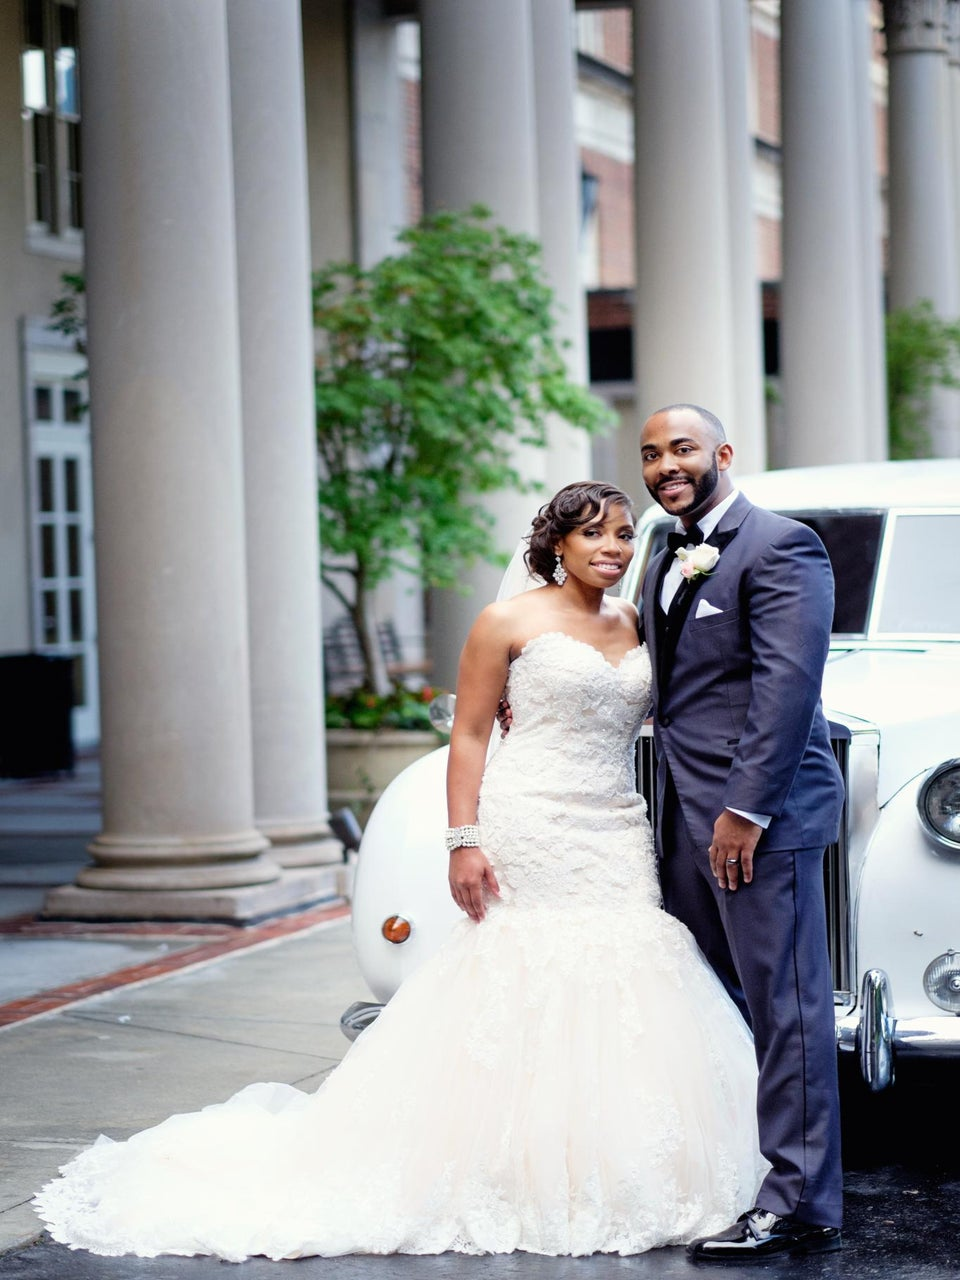 Bridal Bliss: Tiffany and Lenson's Atlanta Wedding